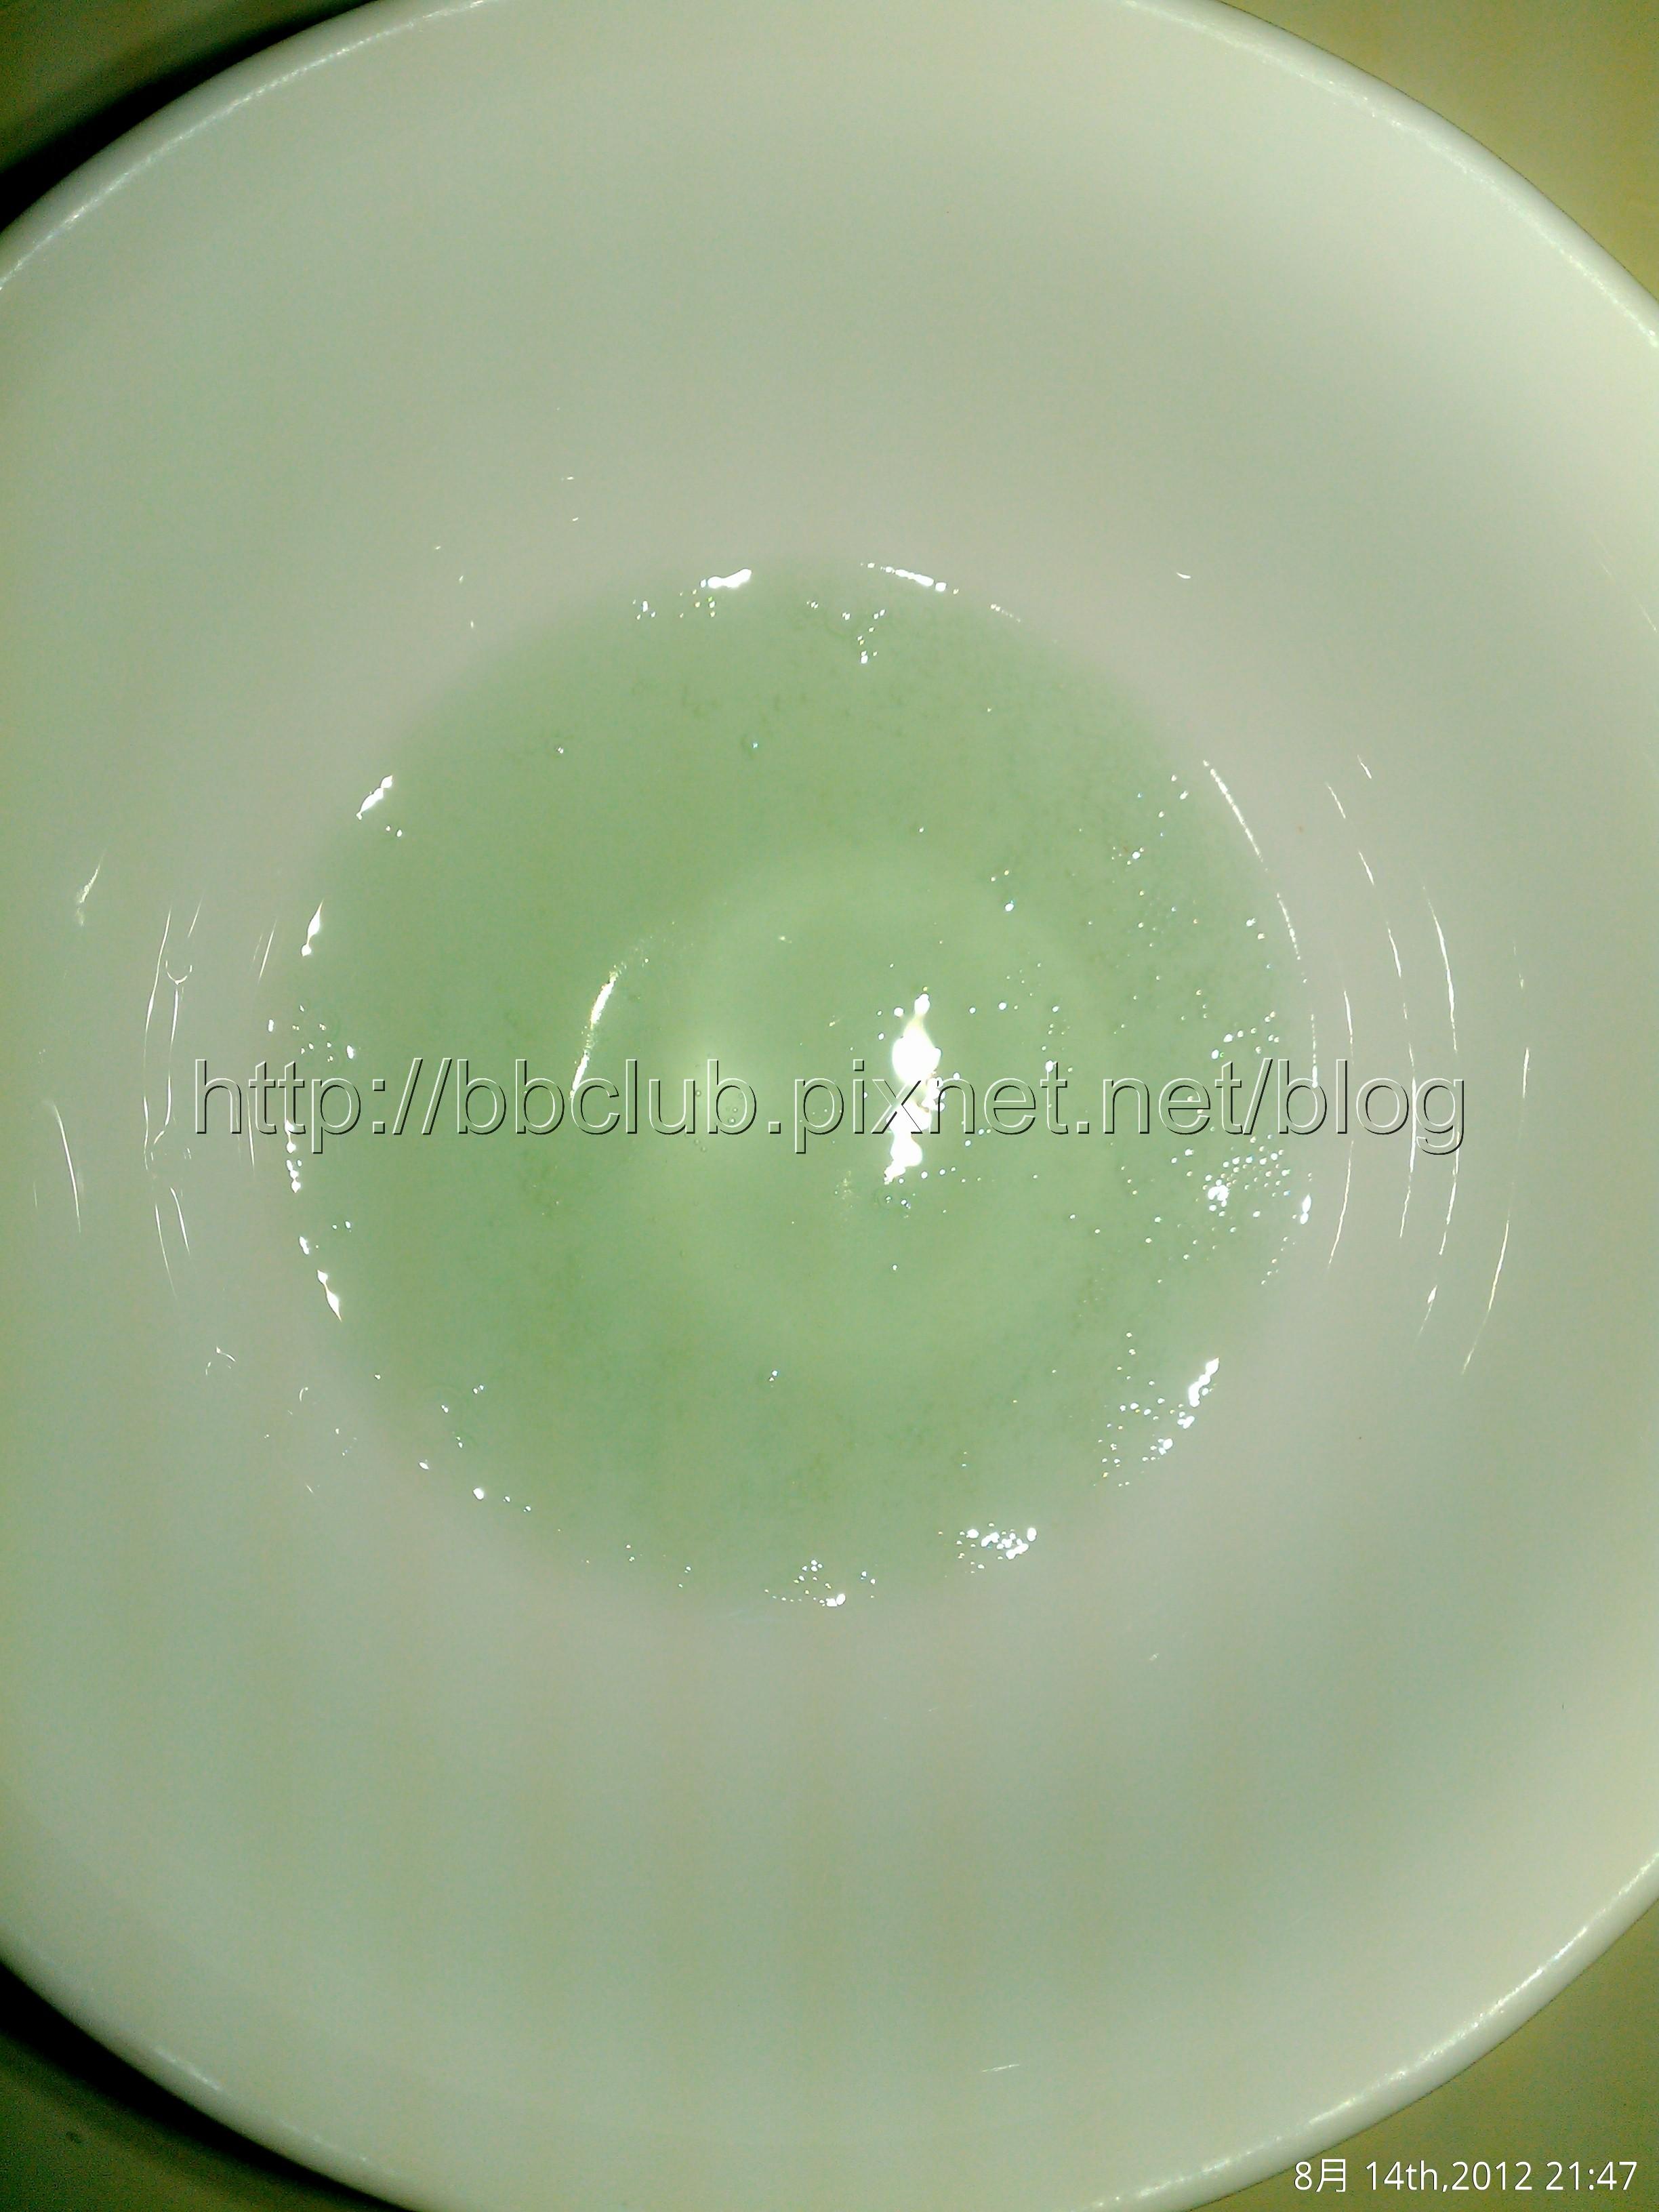 C360_2012-08-14-21-47-43